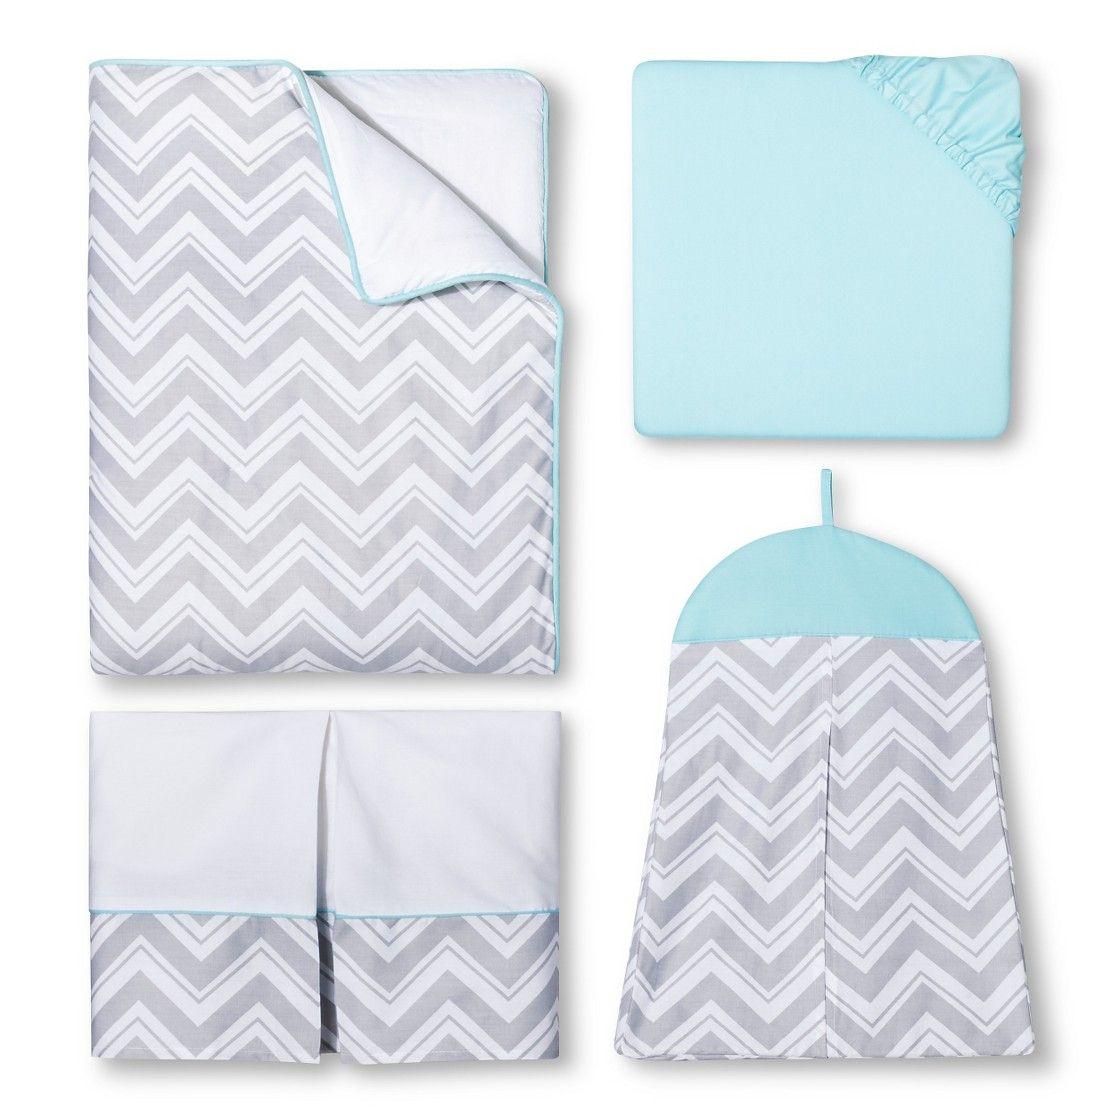 Crib Bedding Set Sweet Jojo Designs Trq Gry Wht 11 Pk Baby Sets